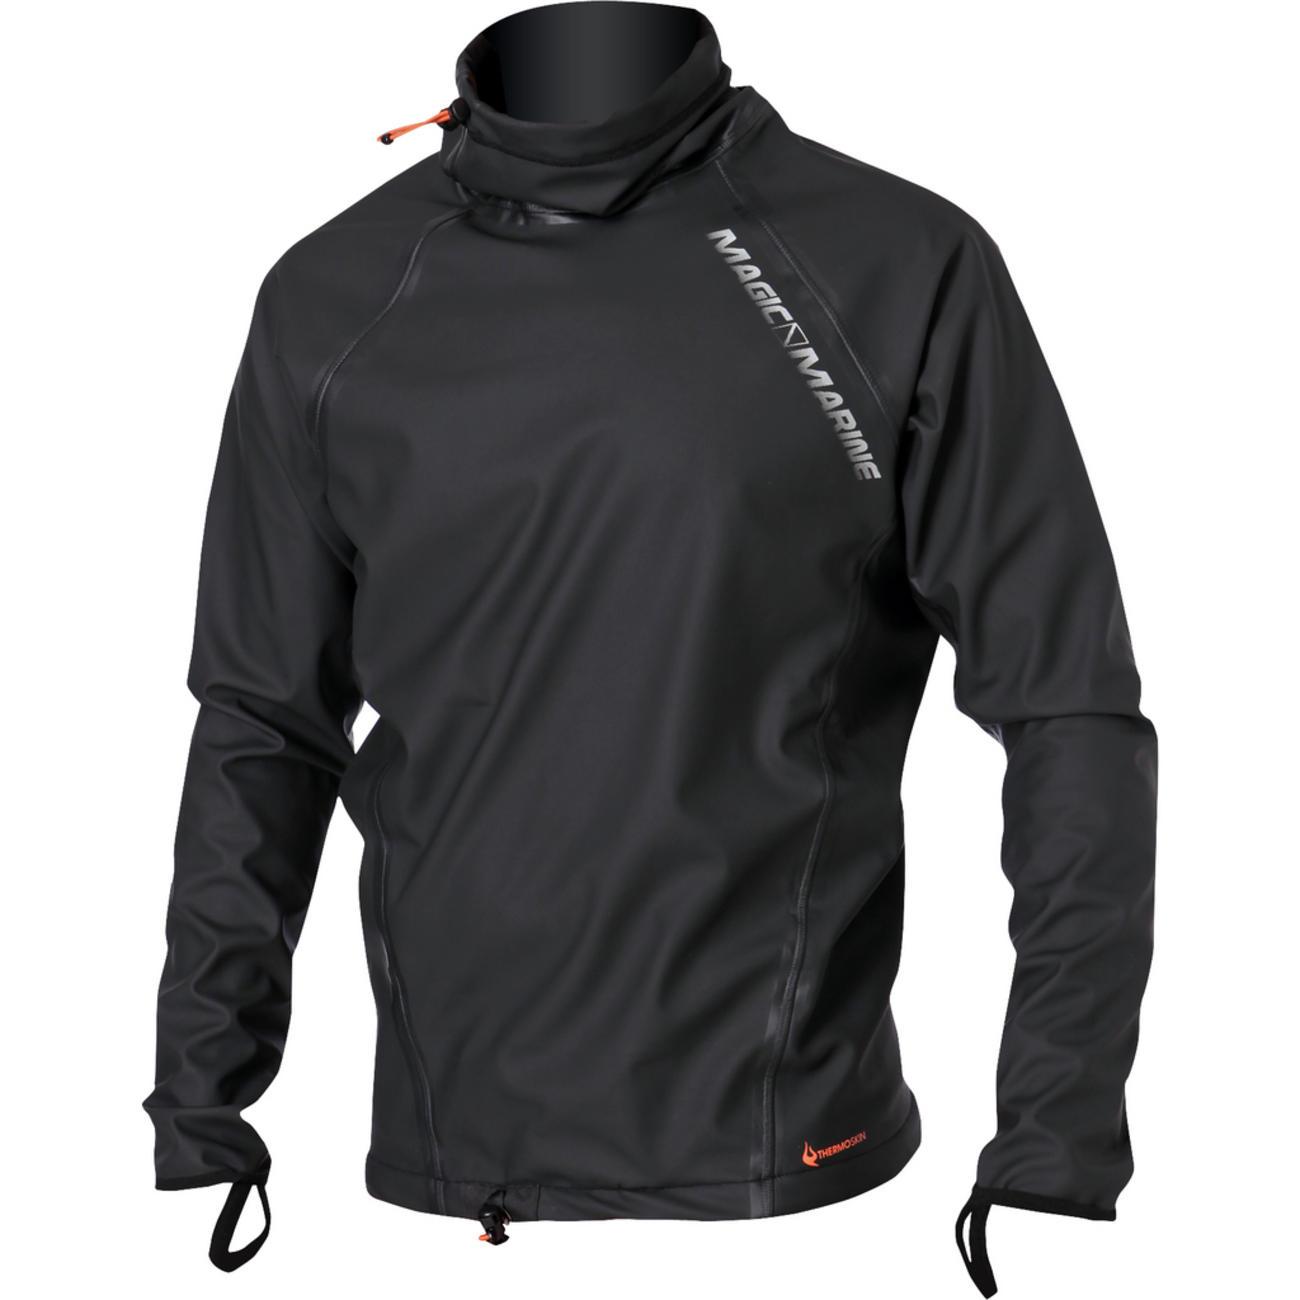 MATCH SPRAYTOP w/fleece フリースパドリングジャケット